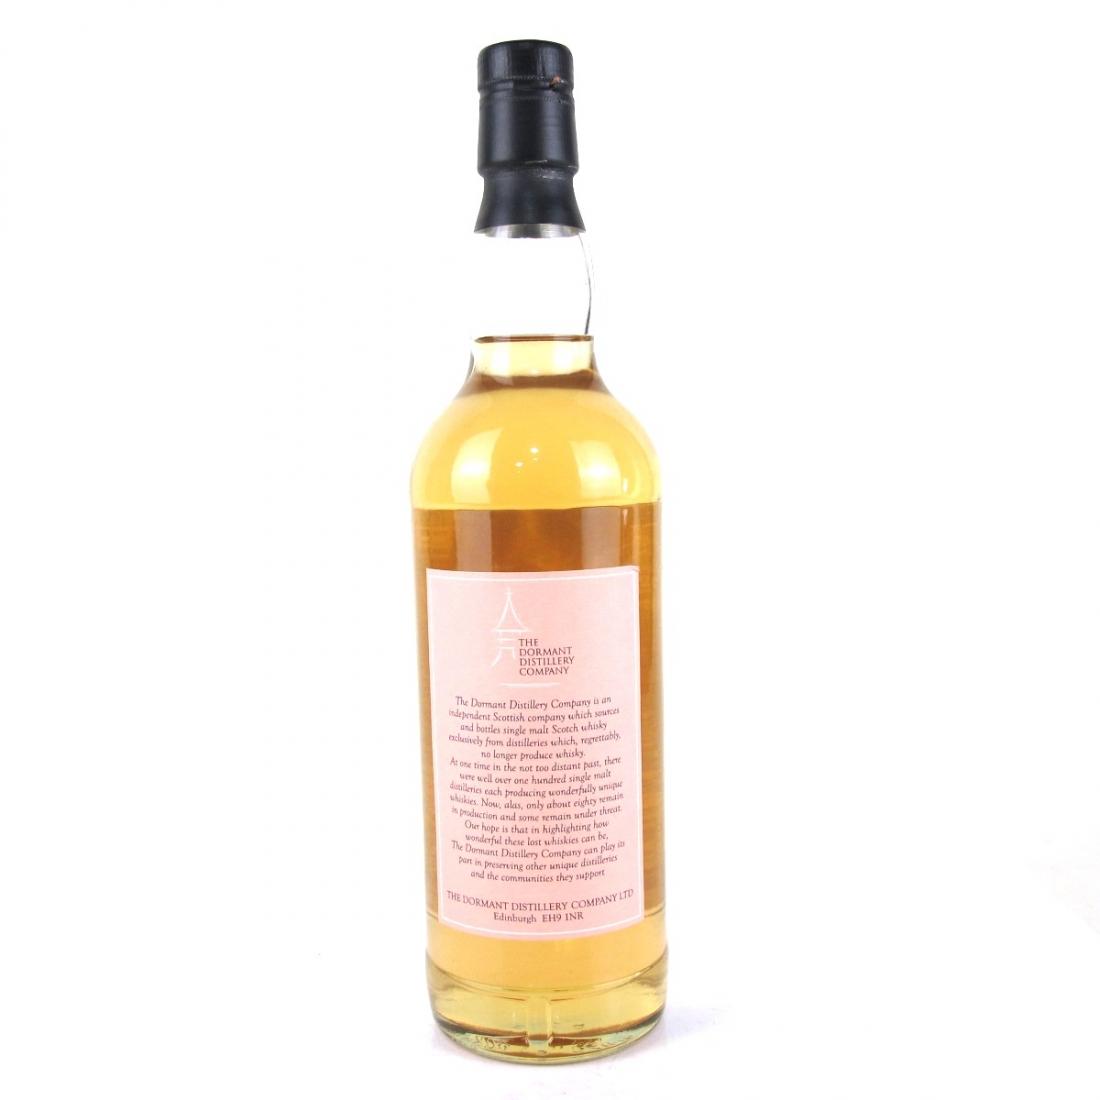 Rosebank 1990 Dormant Distillery Company 15 Year Old